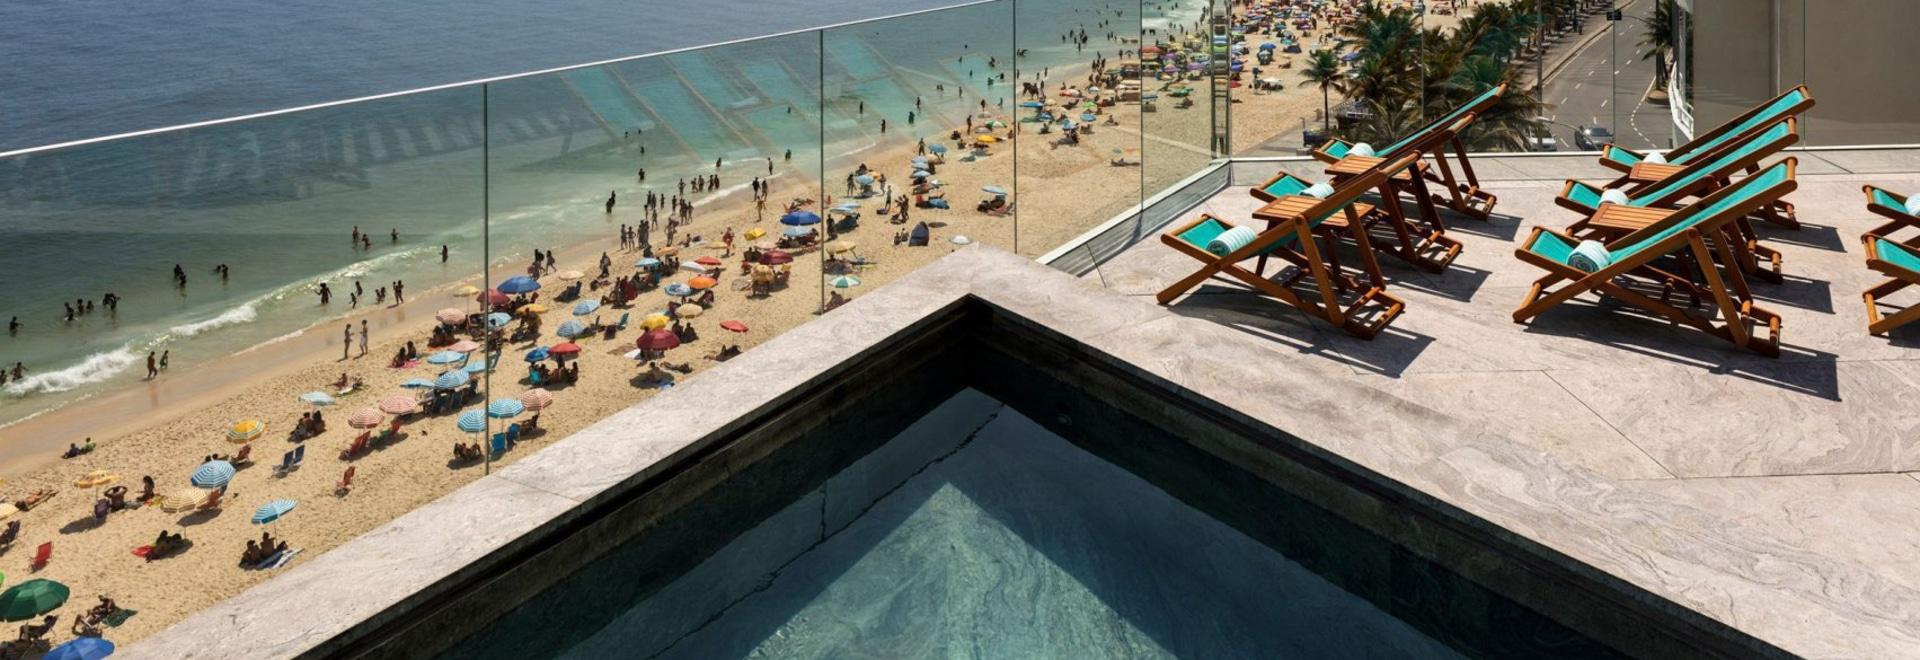 Bernardes Arquitetura erneuert Rios strandnahes Hotel Arpoador